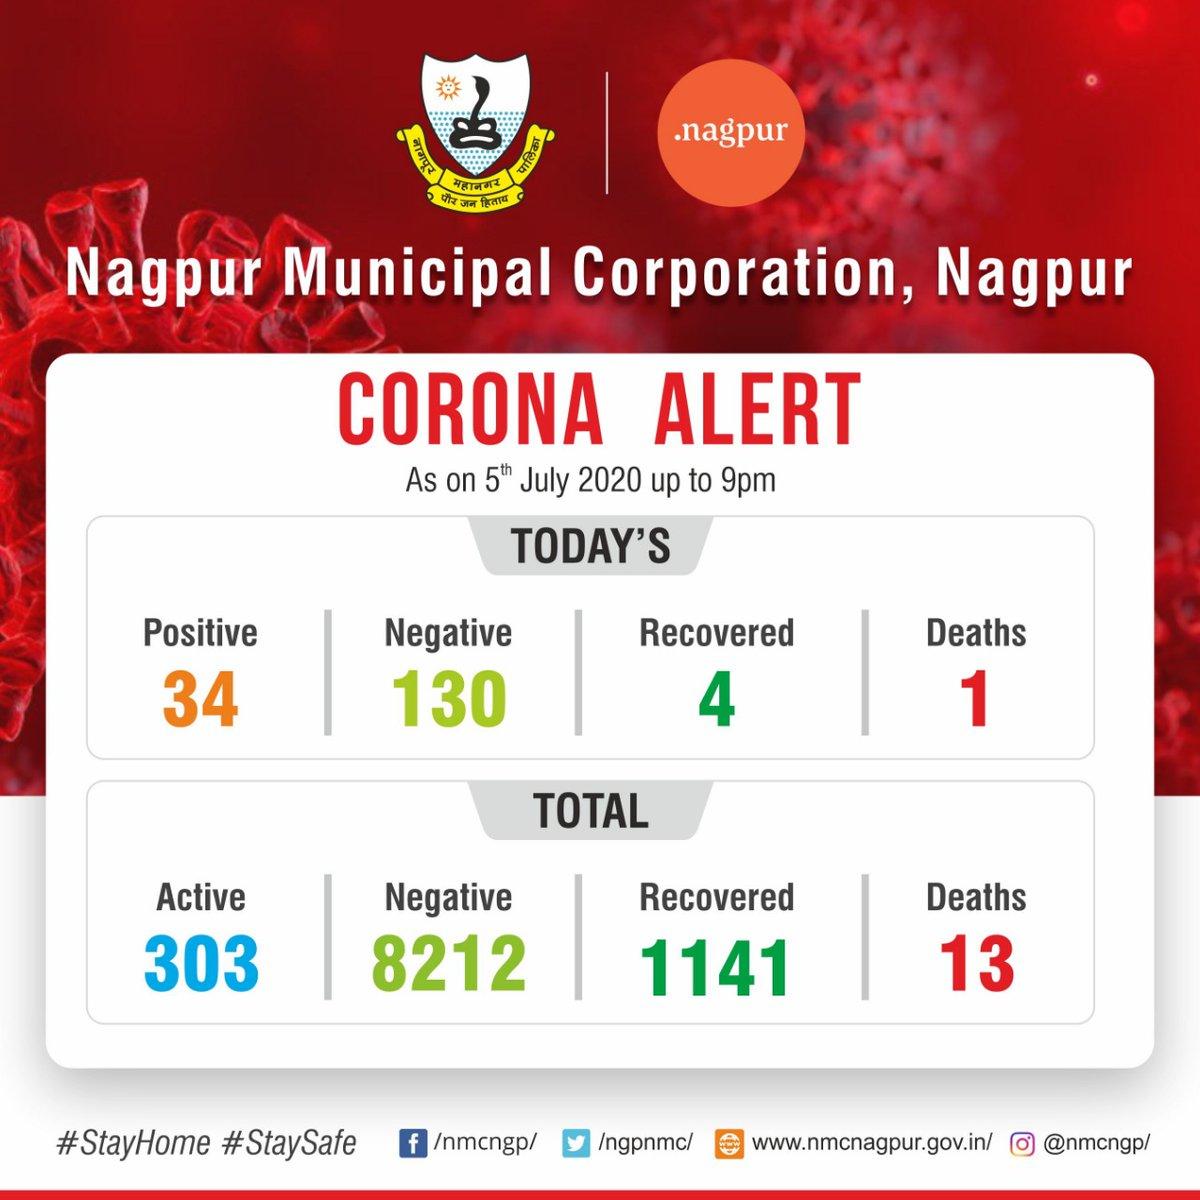 NMC #Covid_19 alert: total status update of the COVID19 cases as on 5 July 2020 #CoronaUpdatesInIndia #WarAgainstVirus #IndiaFightsCoronavirus https://t.co/uDucEXe8gW